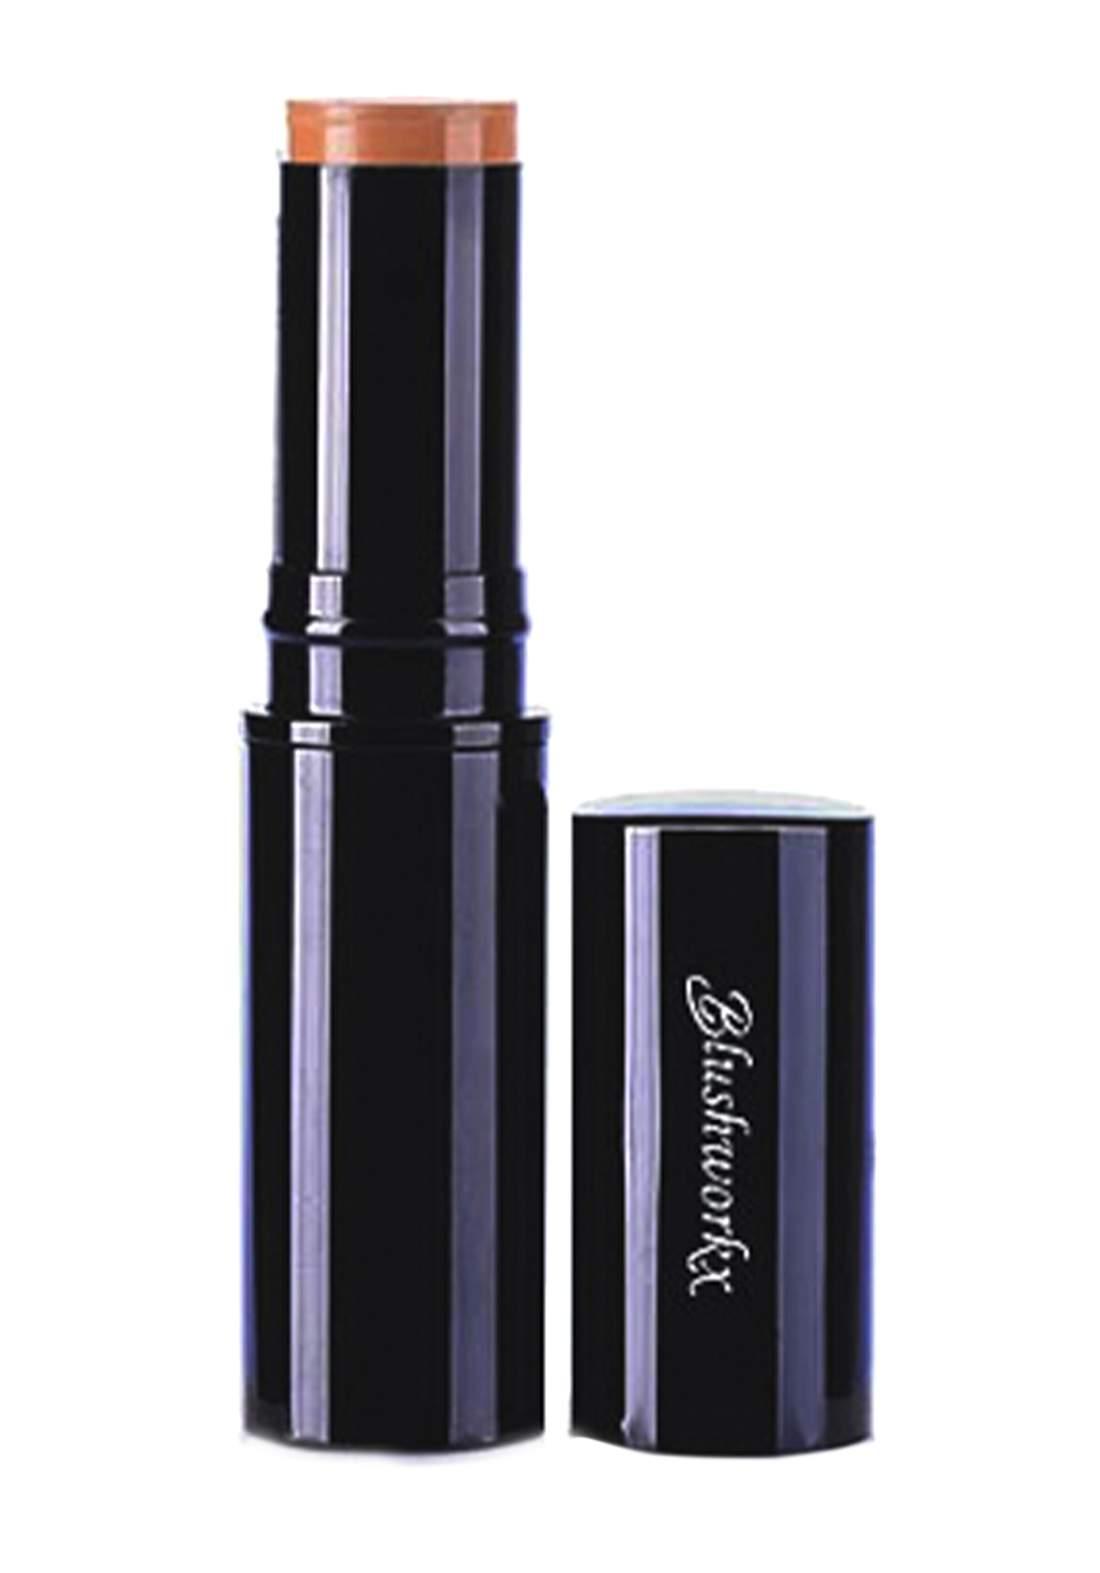 Blushworkx Hollywood Flawless Foundation Stick 7g Dark كونسيلر